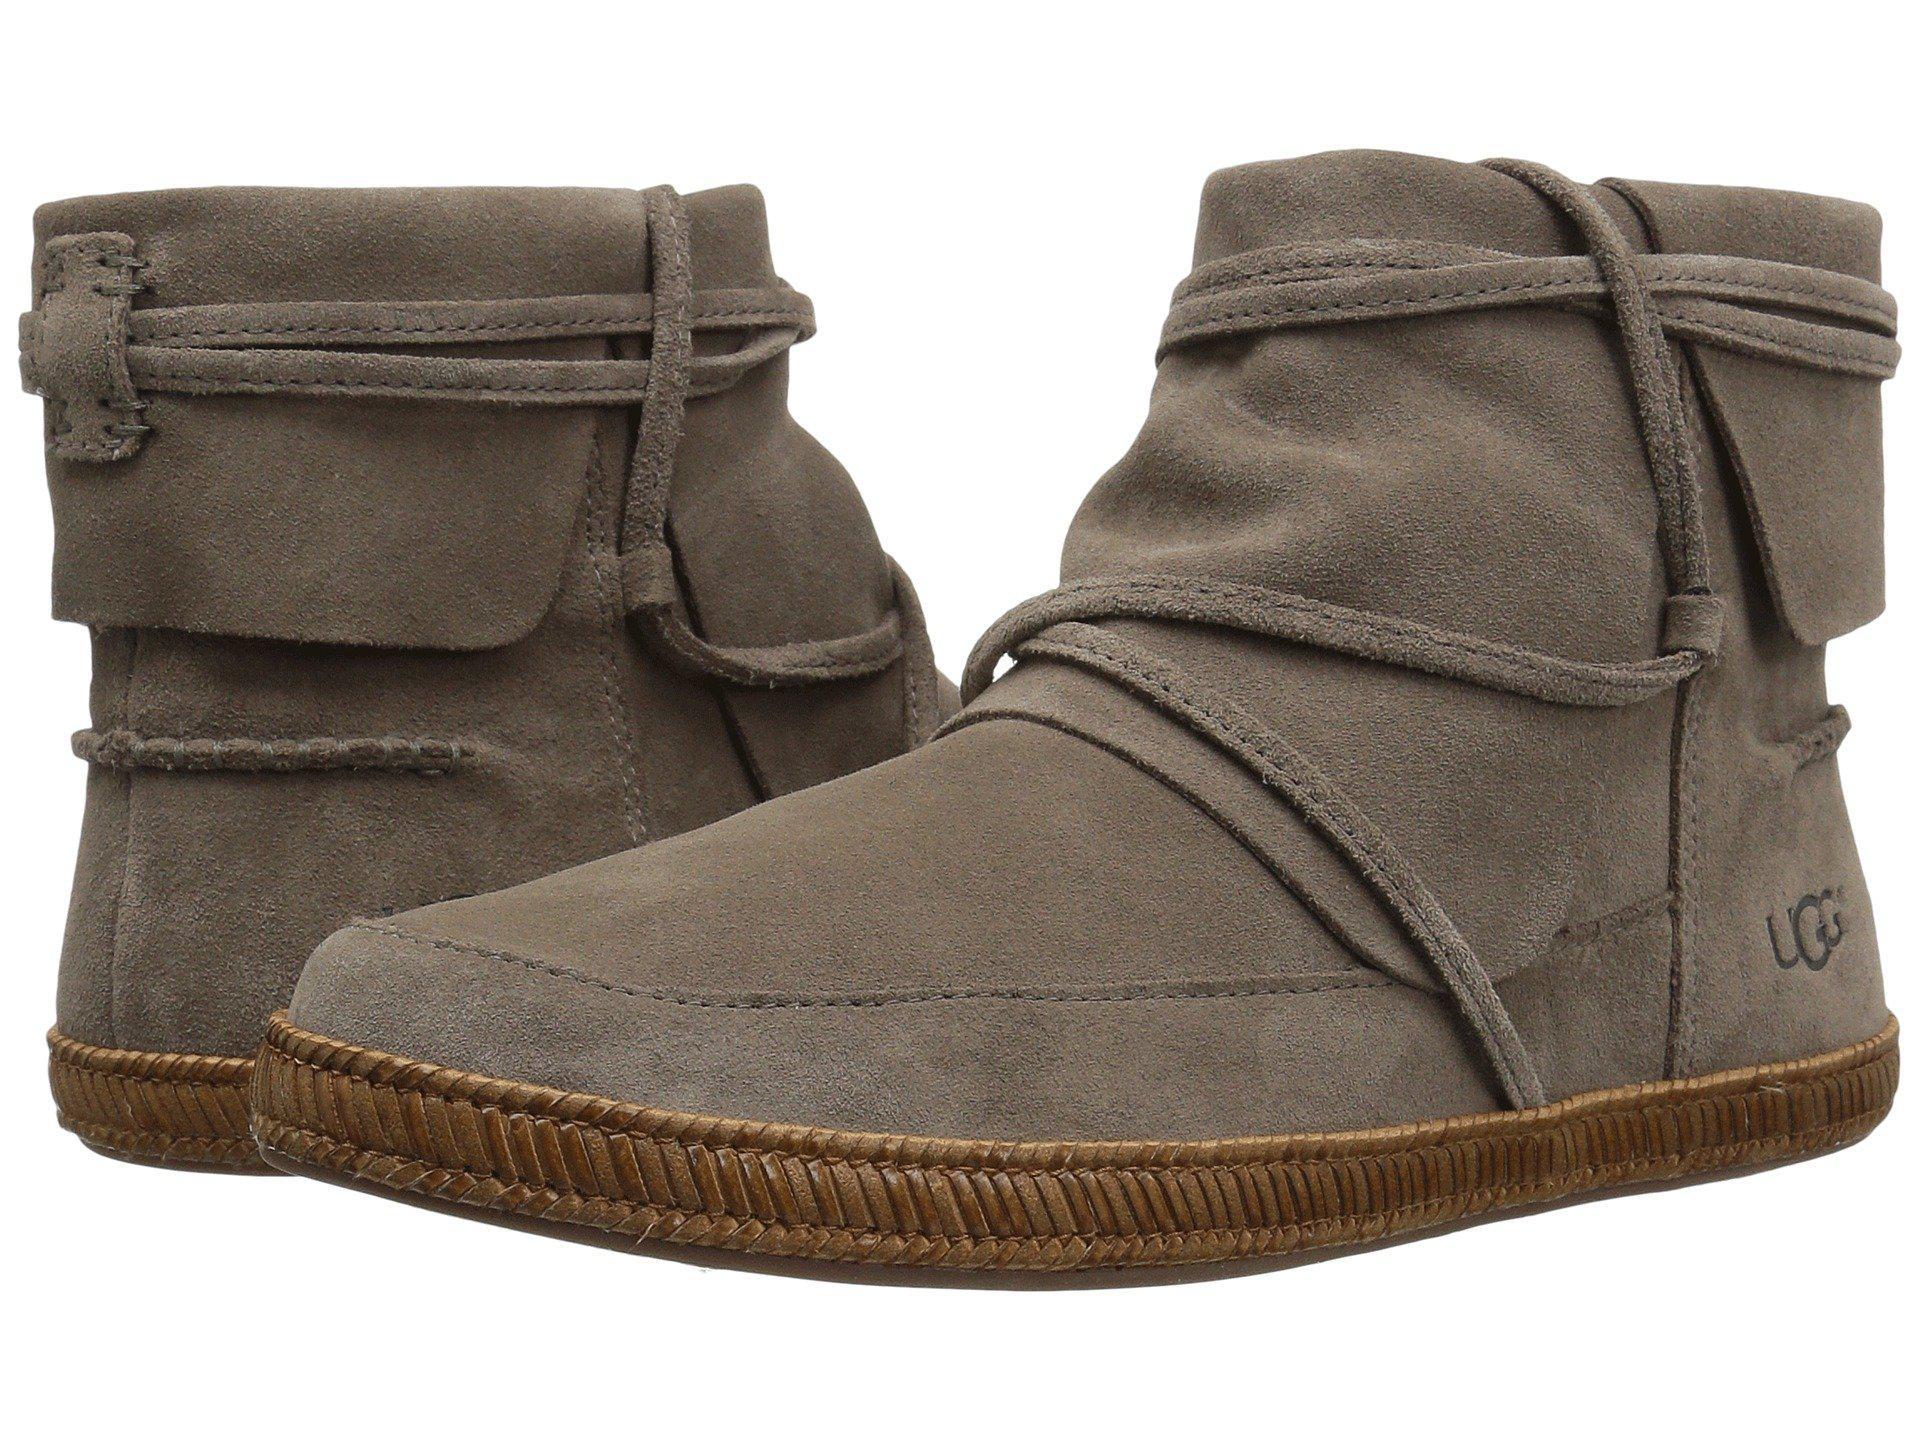 399004ef41db Lyst - UGG Reid (chestnut) Women s Boots